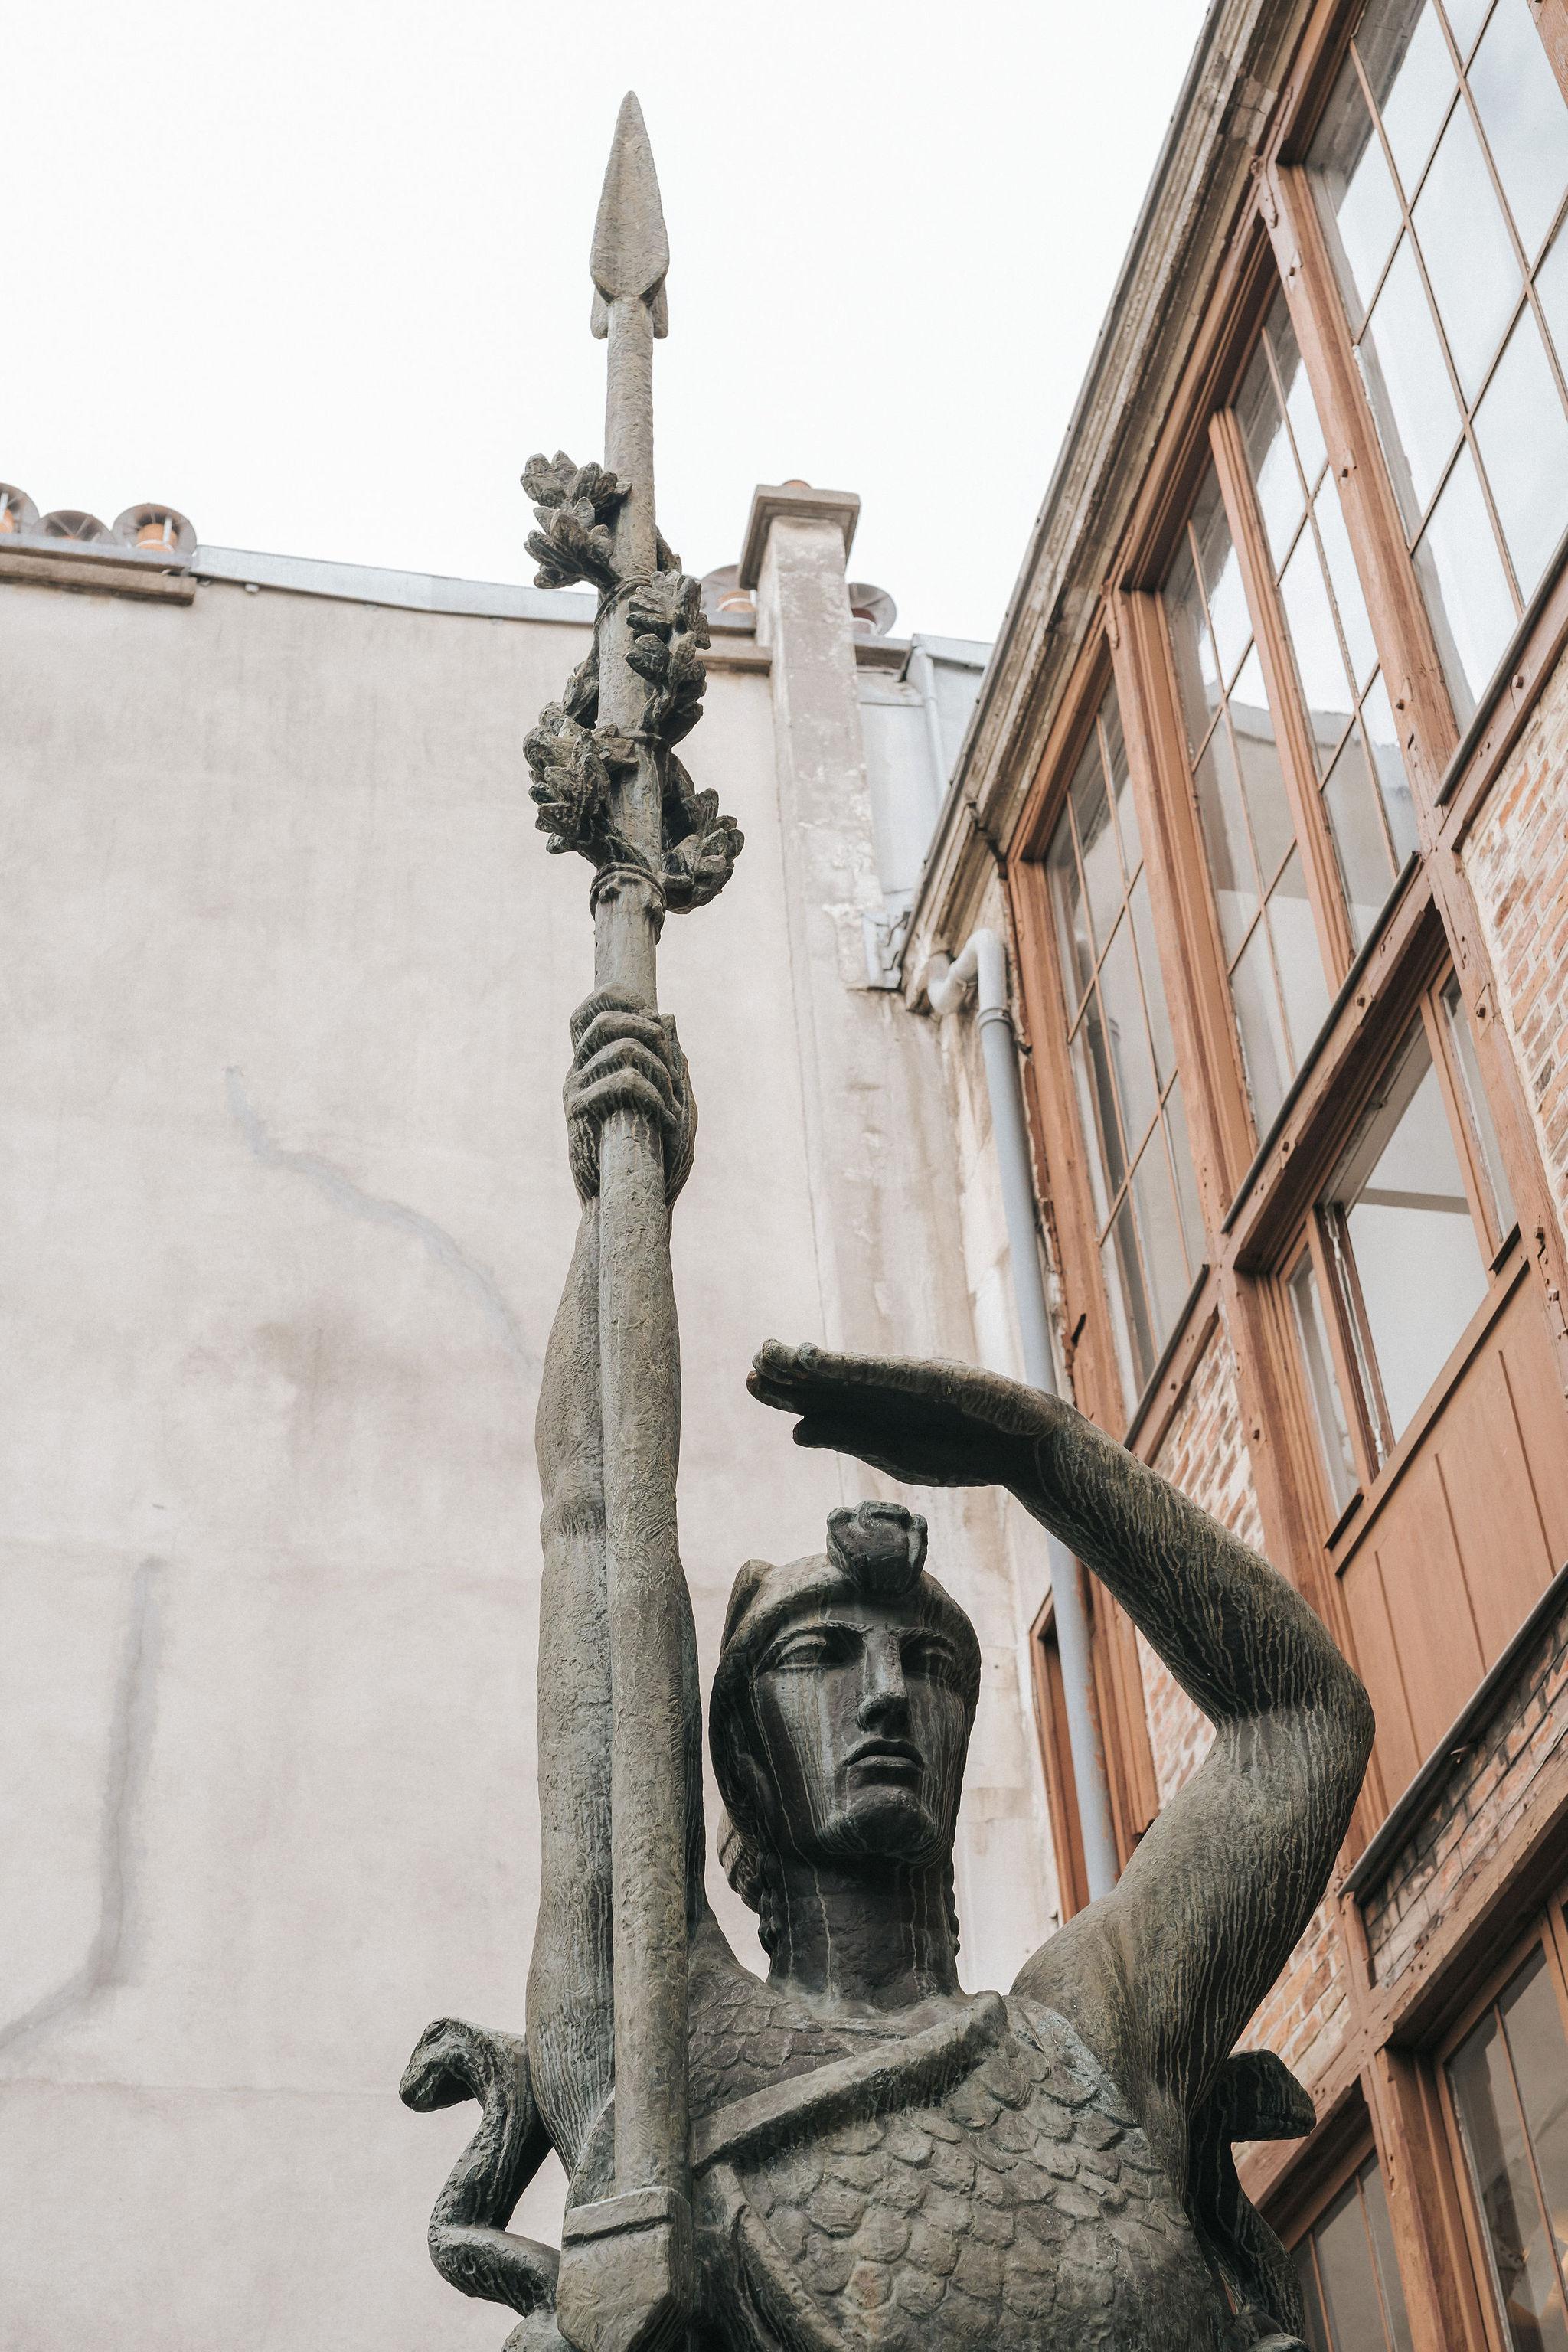 musee bourdelle statue iheartparisfr.jpg